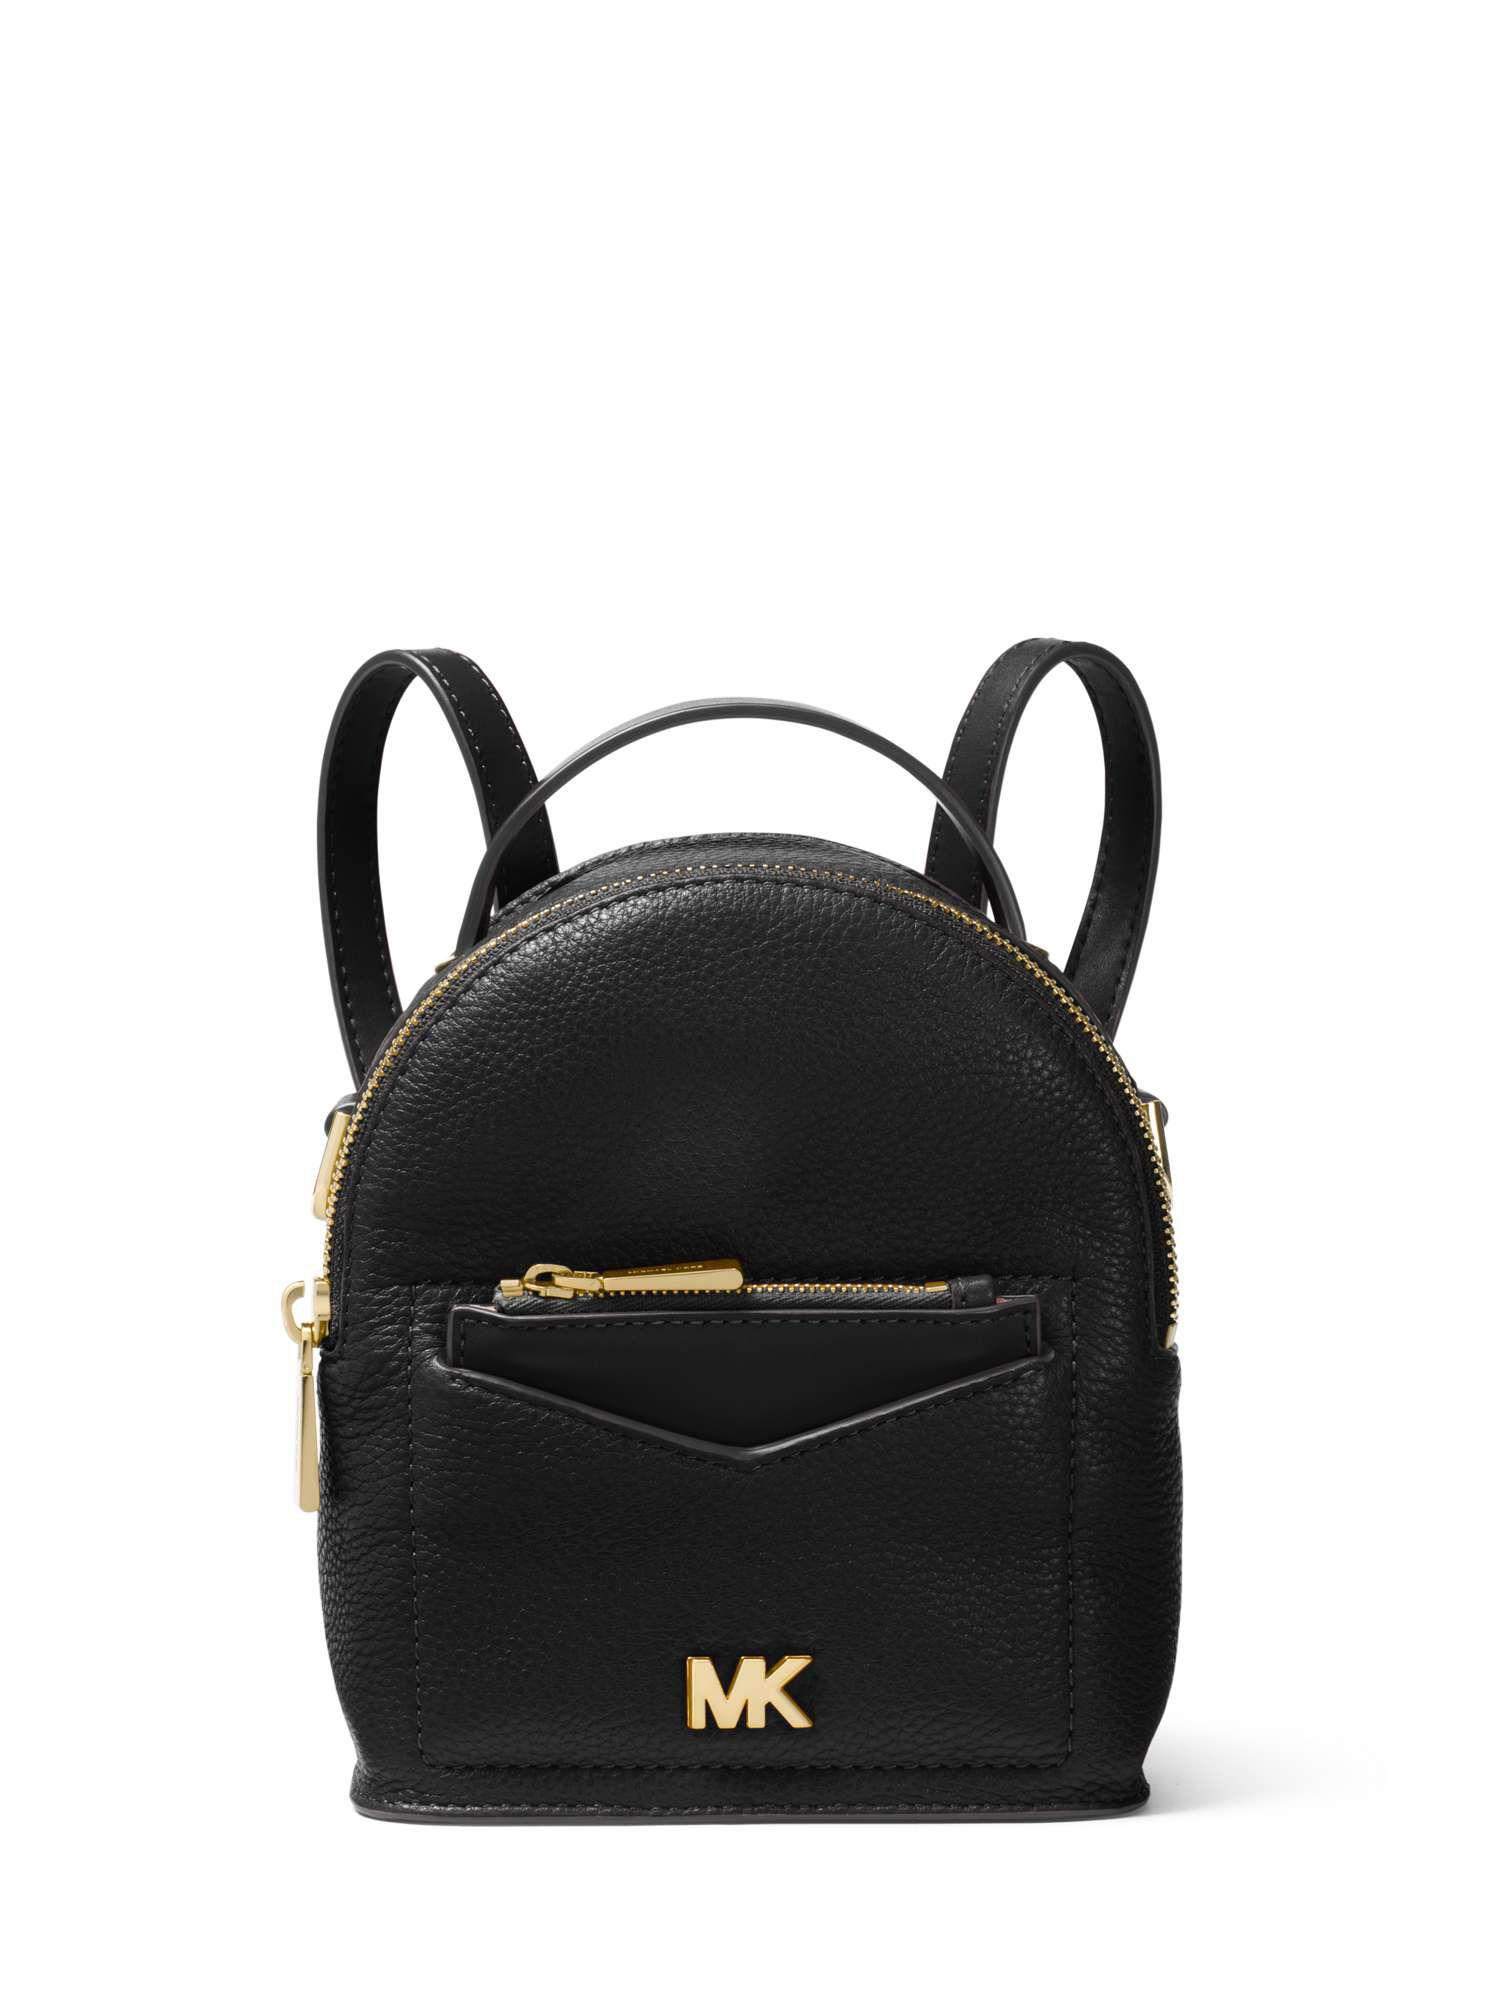 c7e6f62c80 Michael Kors Jessa Xs Covertible Backpack Bag in Black - Lyst